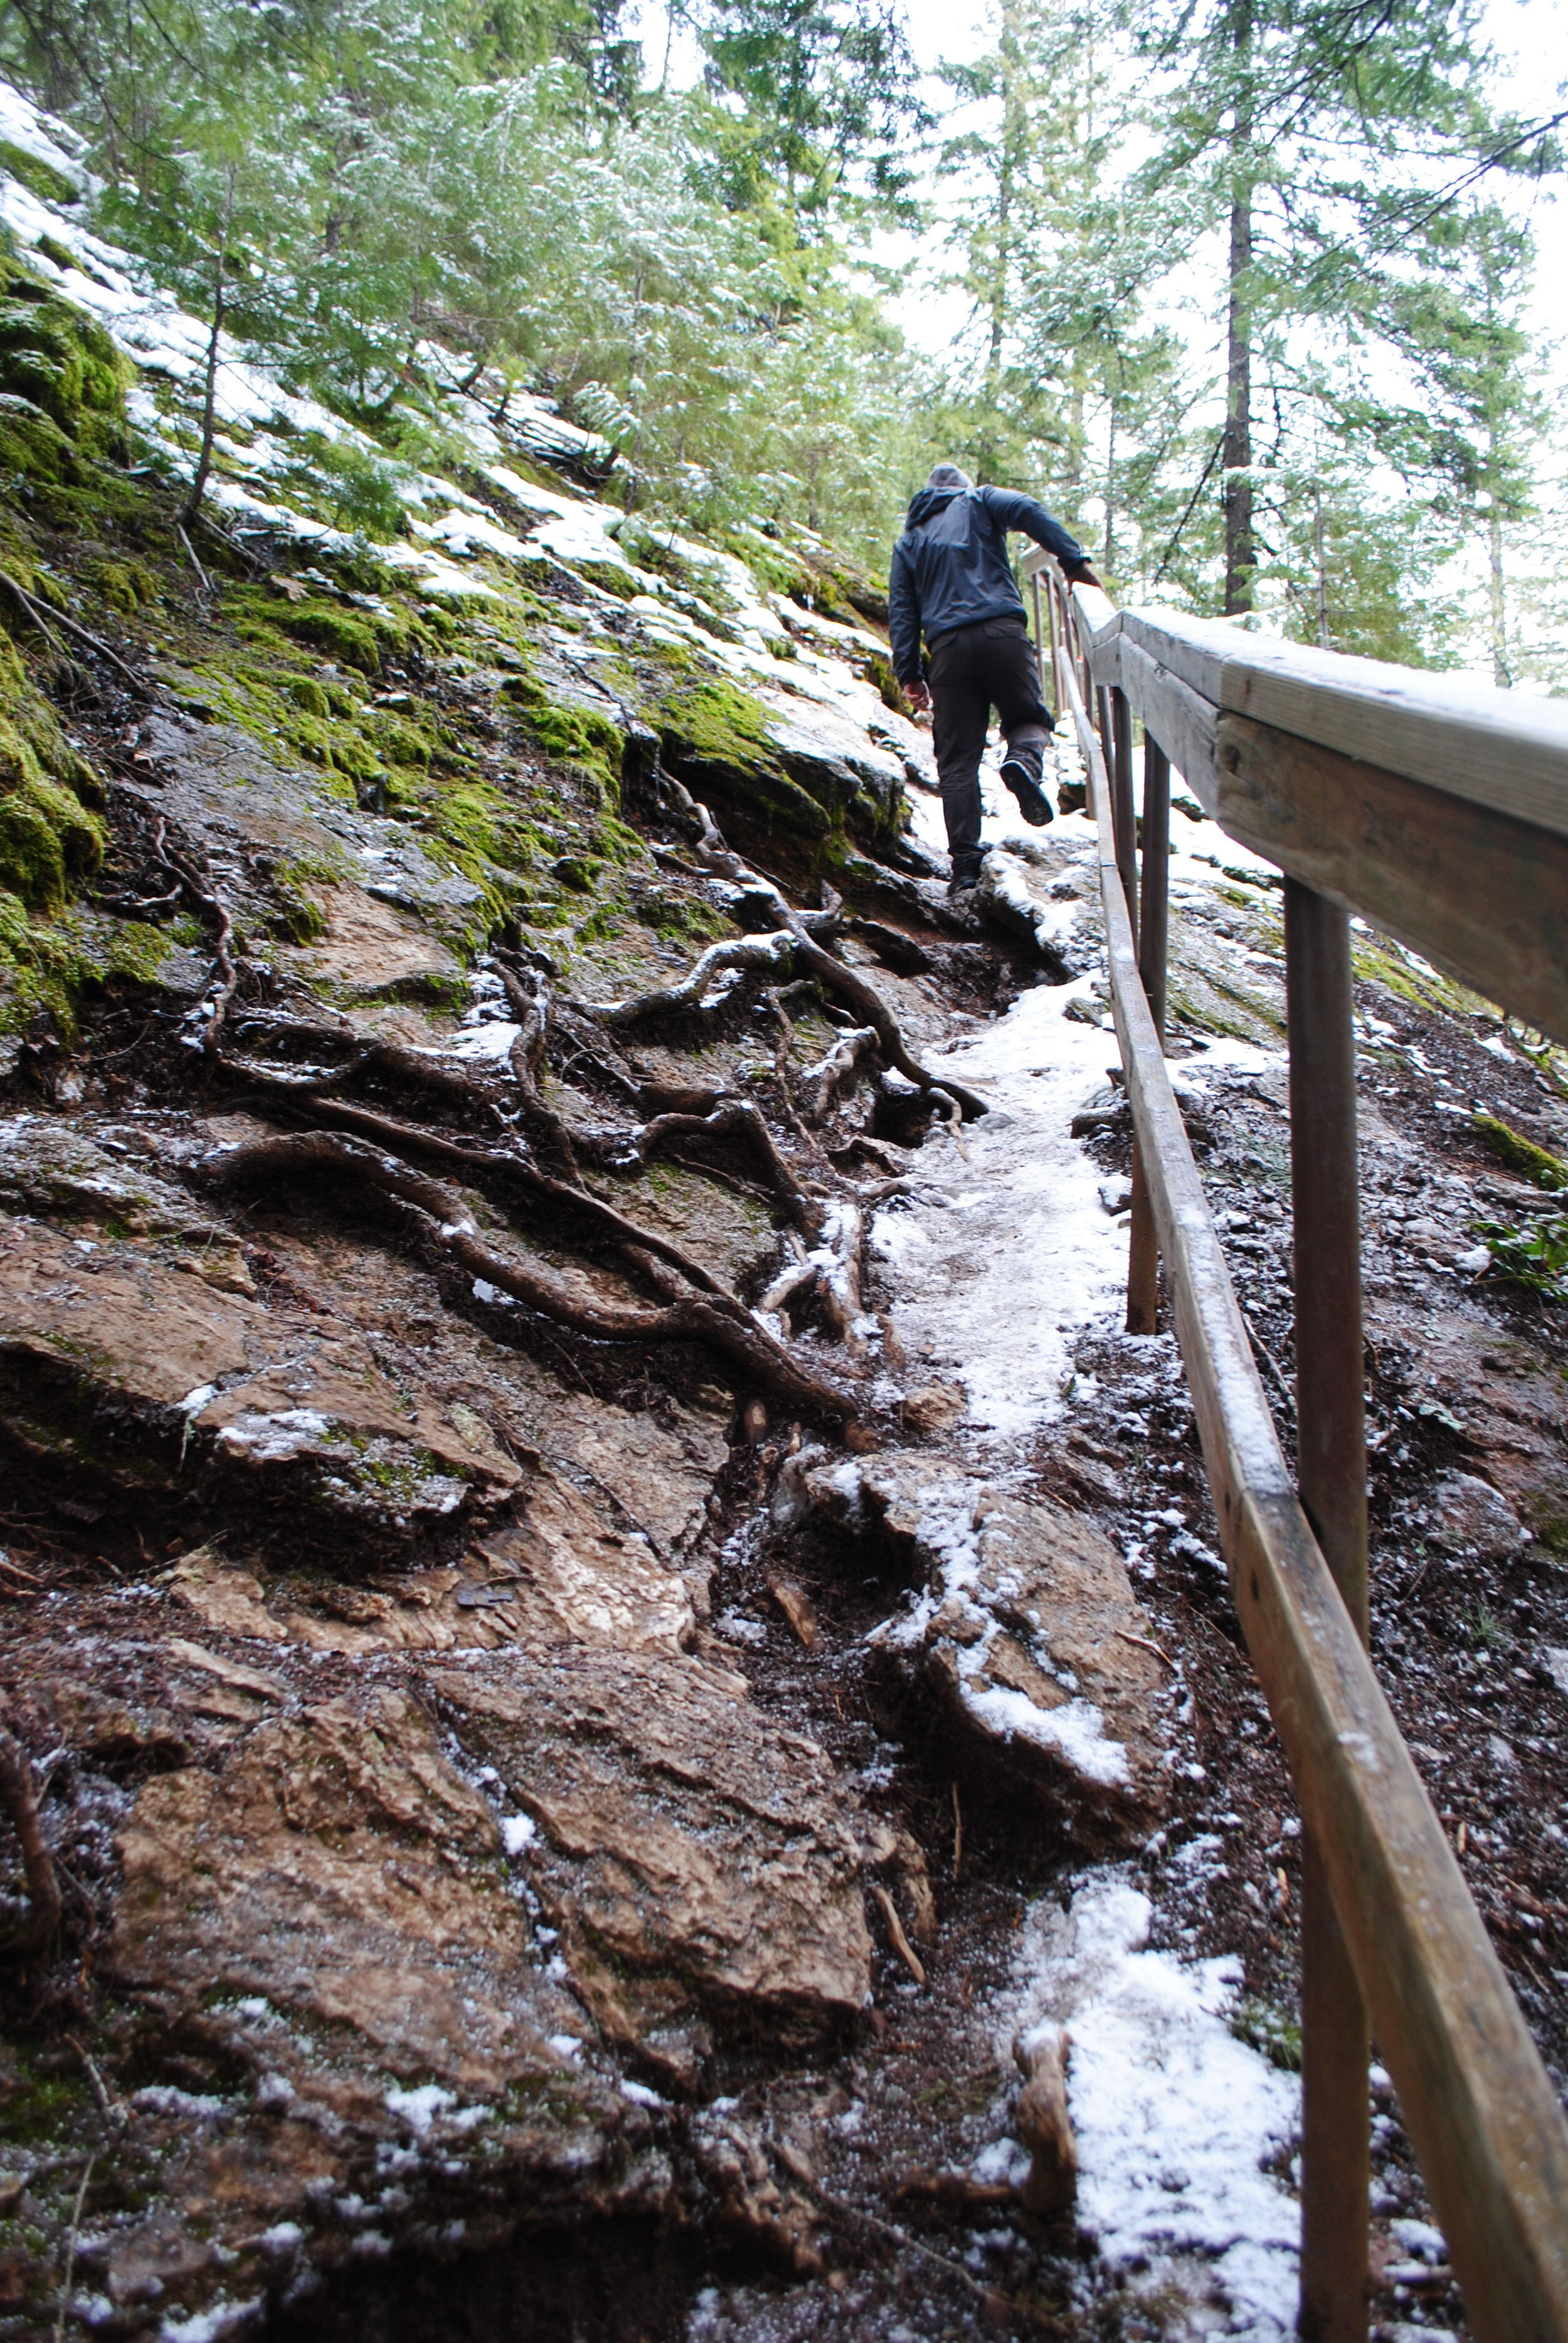 UMPQUA HOT SPRINGS - What to do in Southern Oregon- Things to do in Roseburg - Diamond Lake - Events Calendar (26).JPG